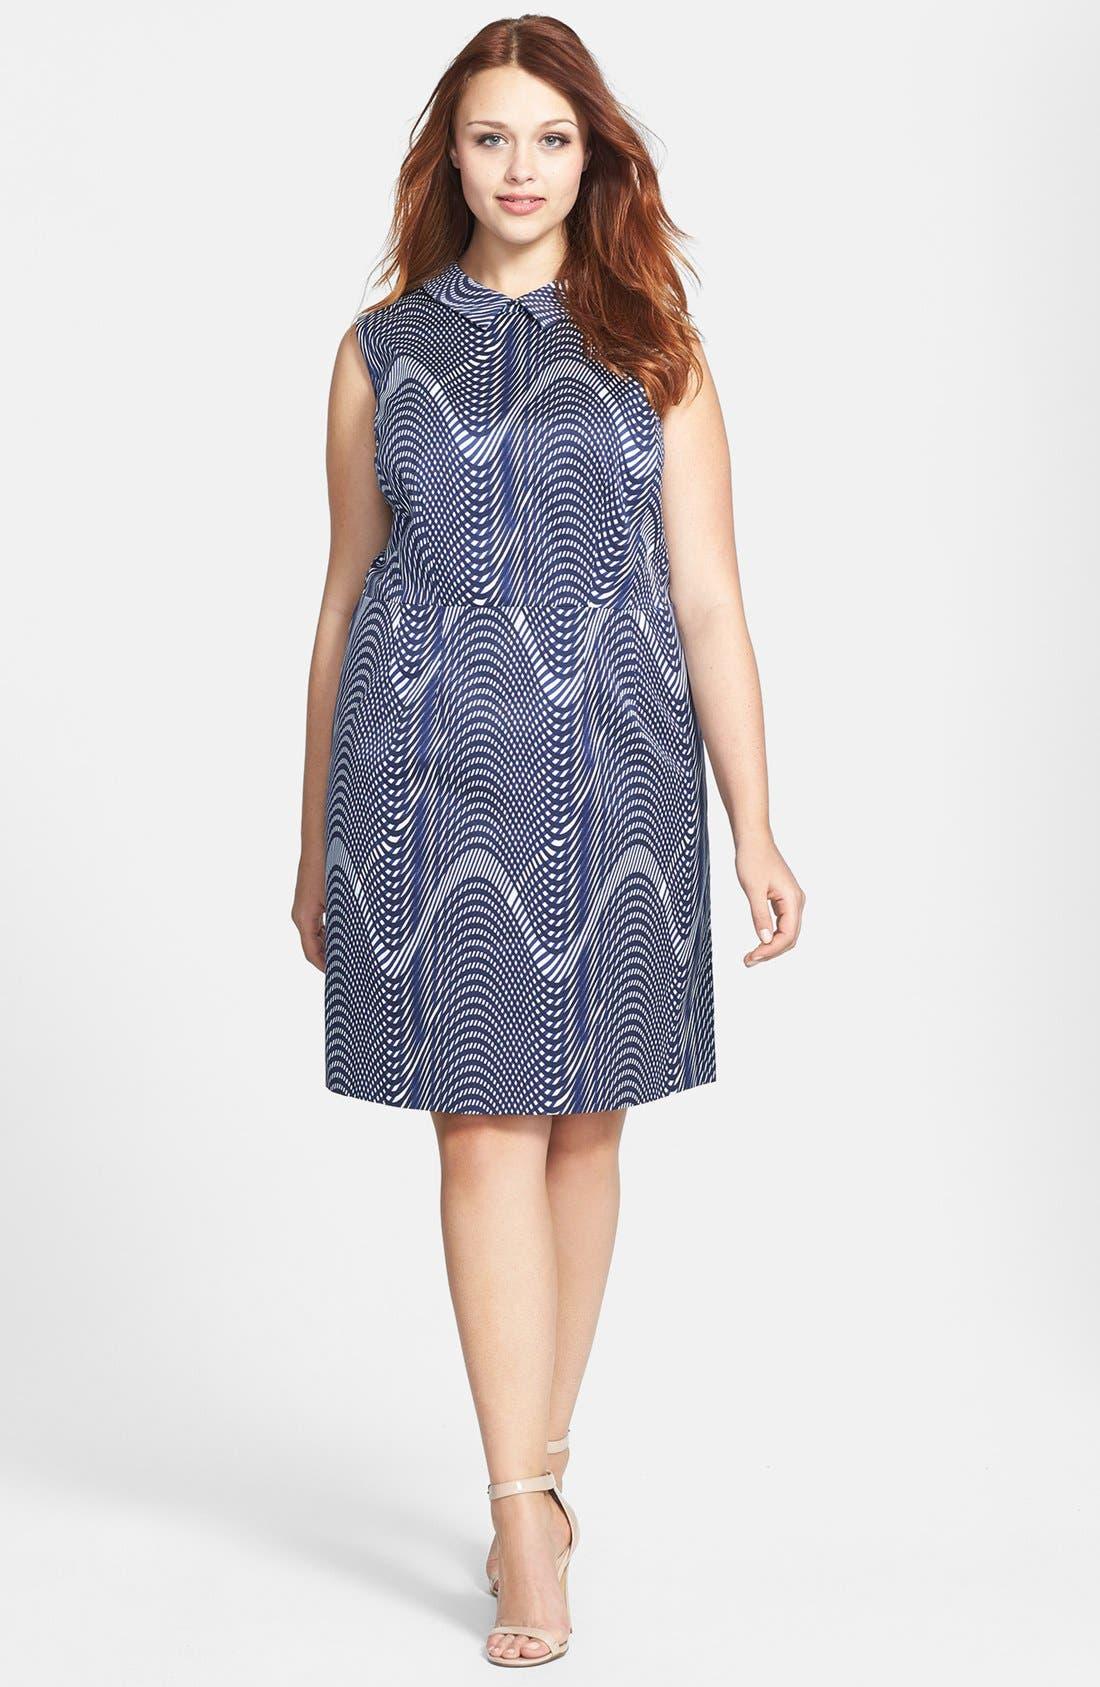 Alternate Image 1 Selected - Halogen® Faille Sheath Dress (Plus Size)